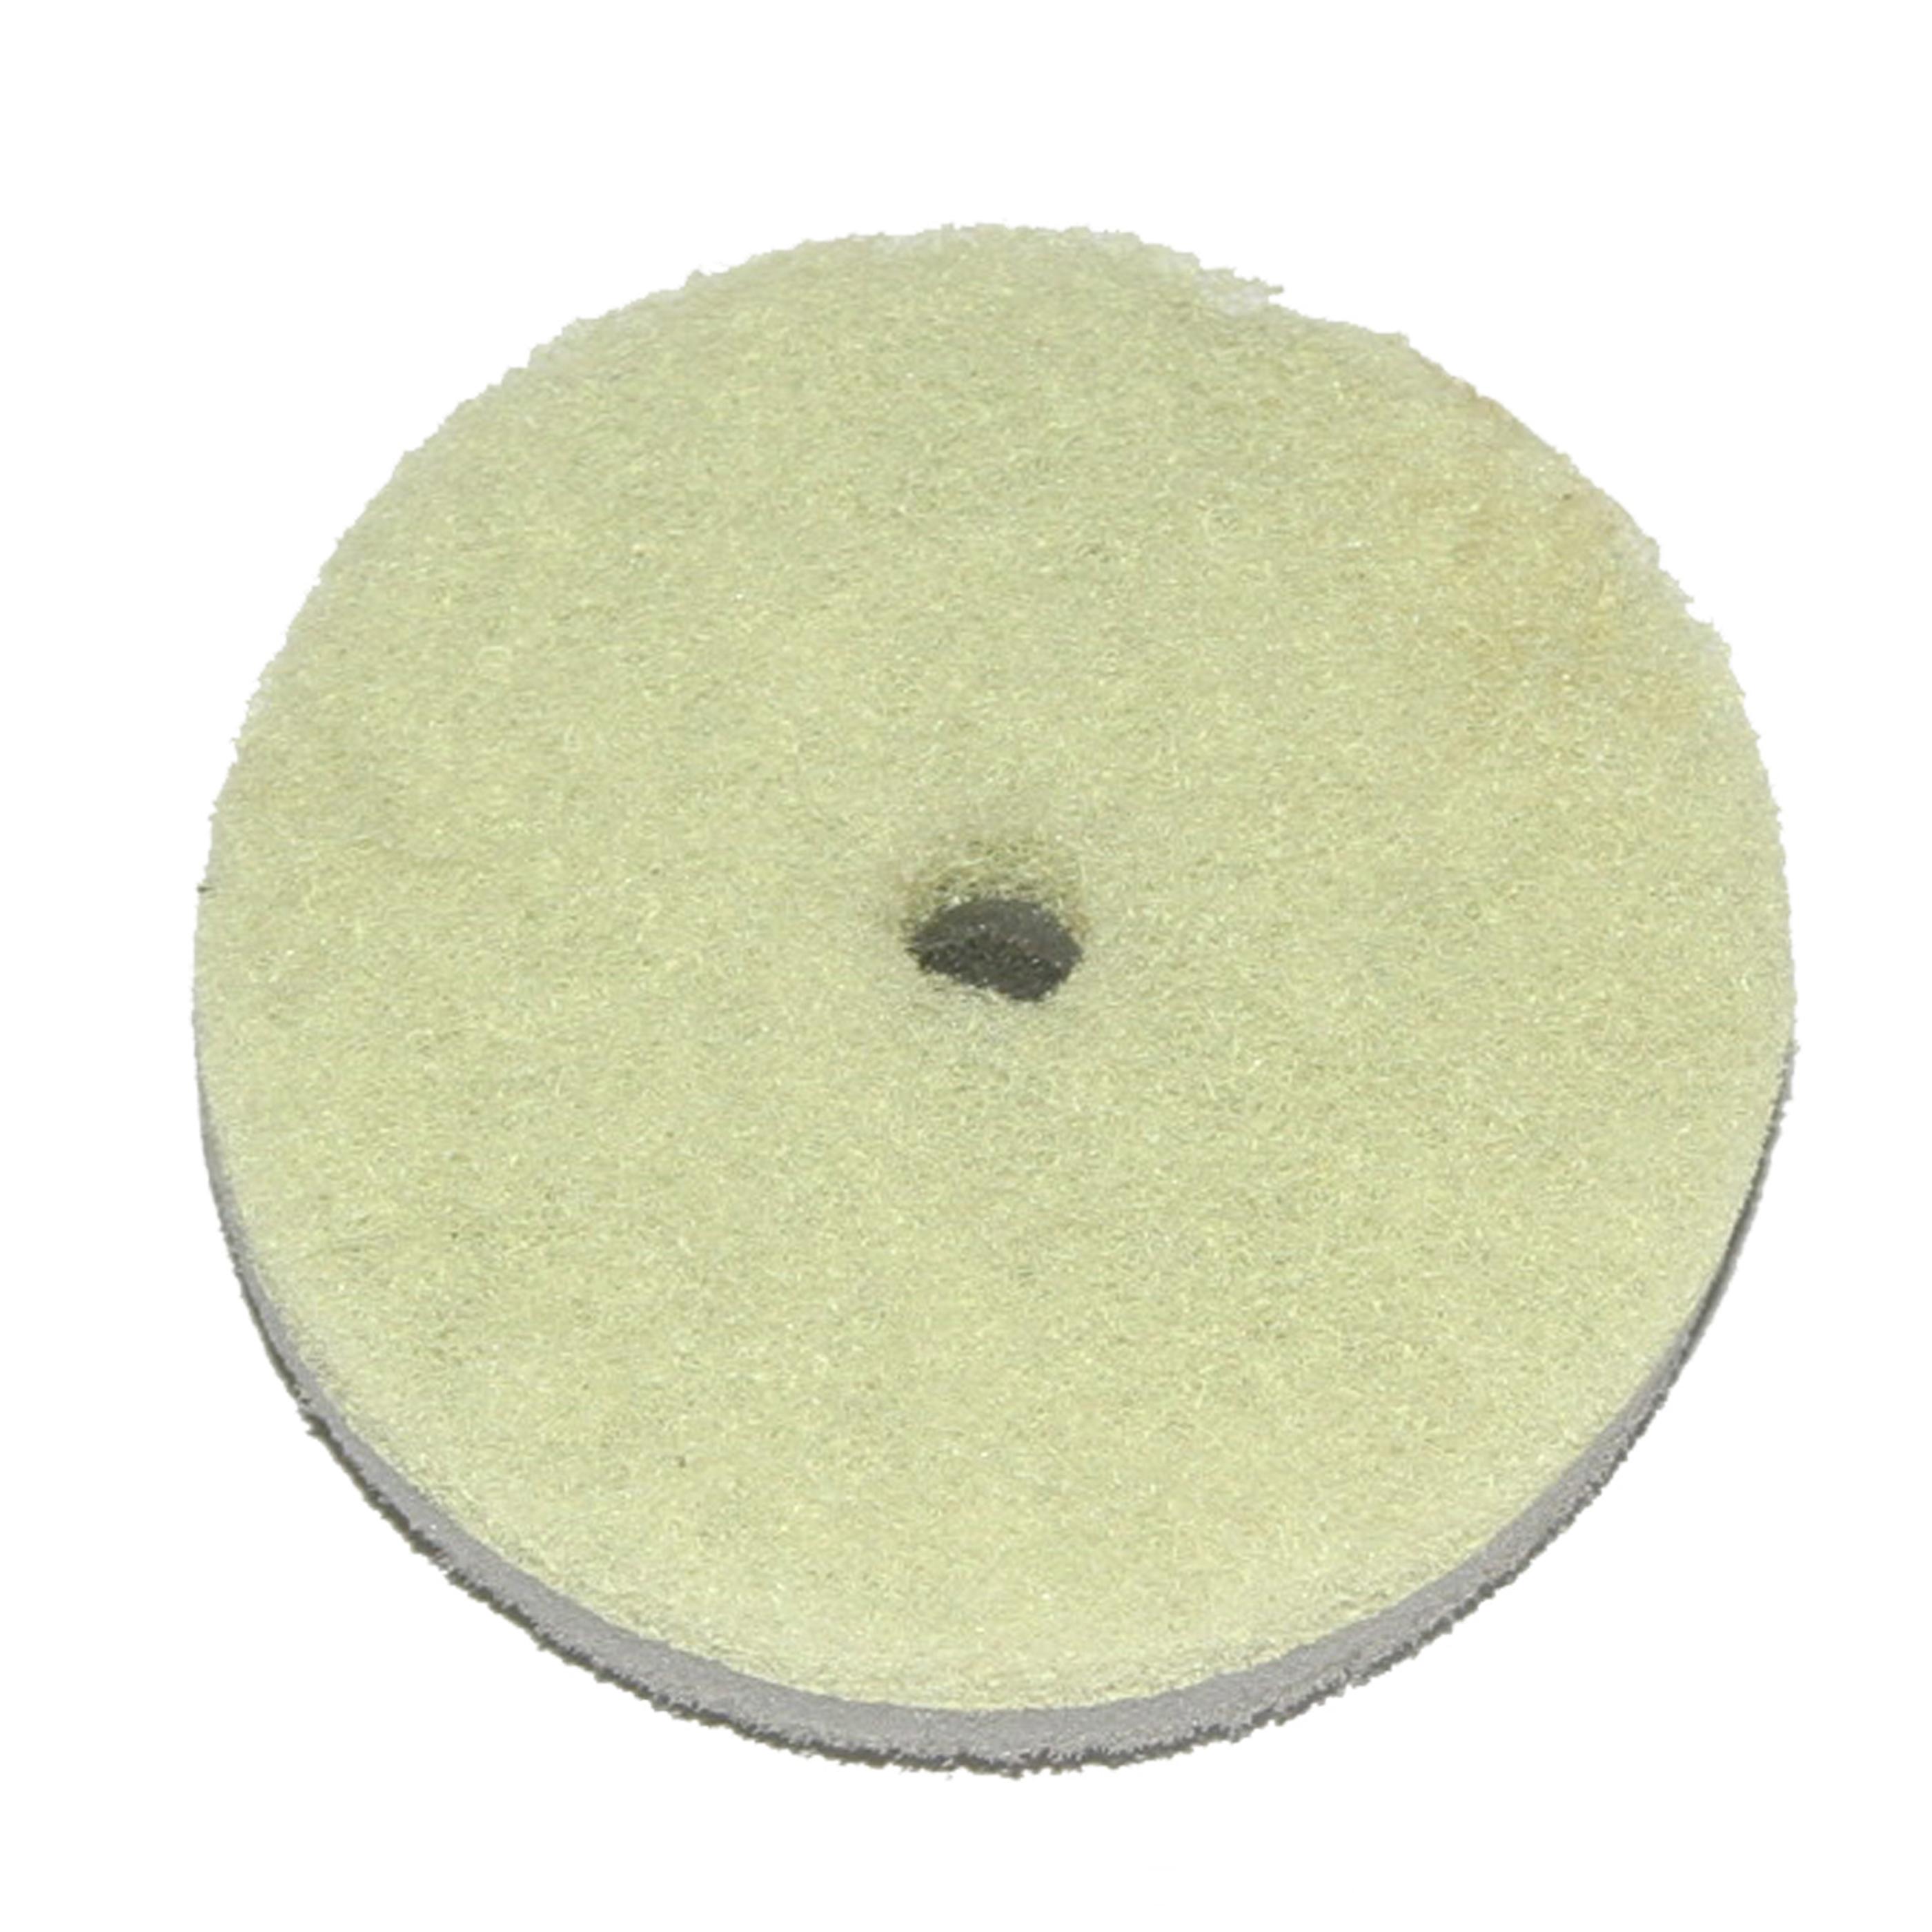 Disksvamp Round Lime Ljusgrå Bosign